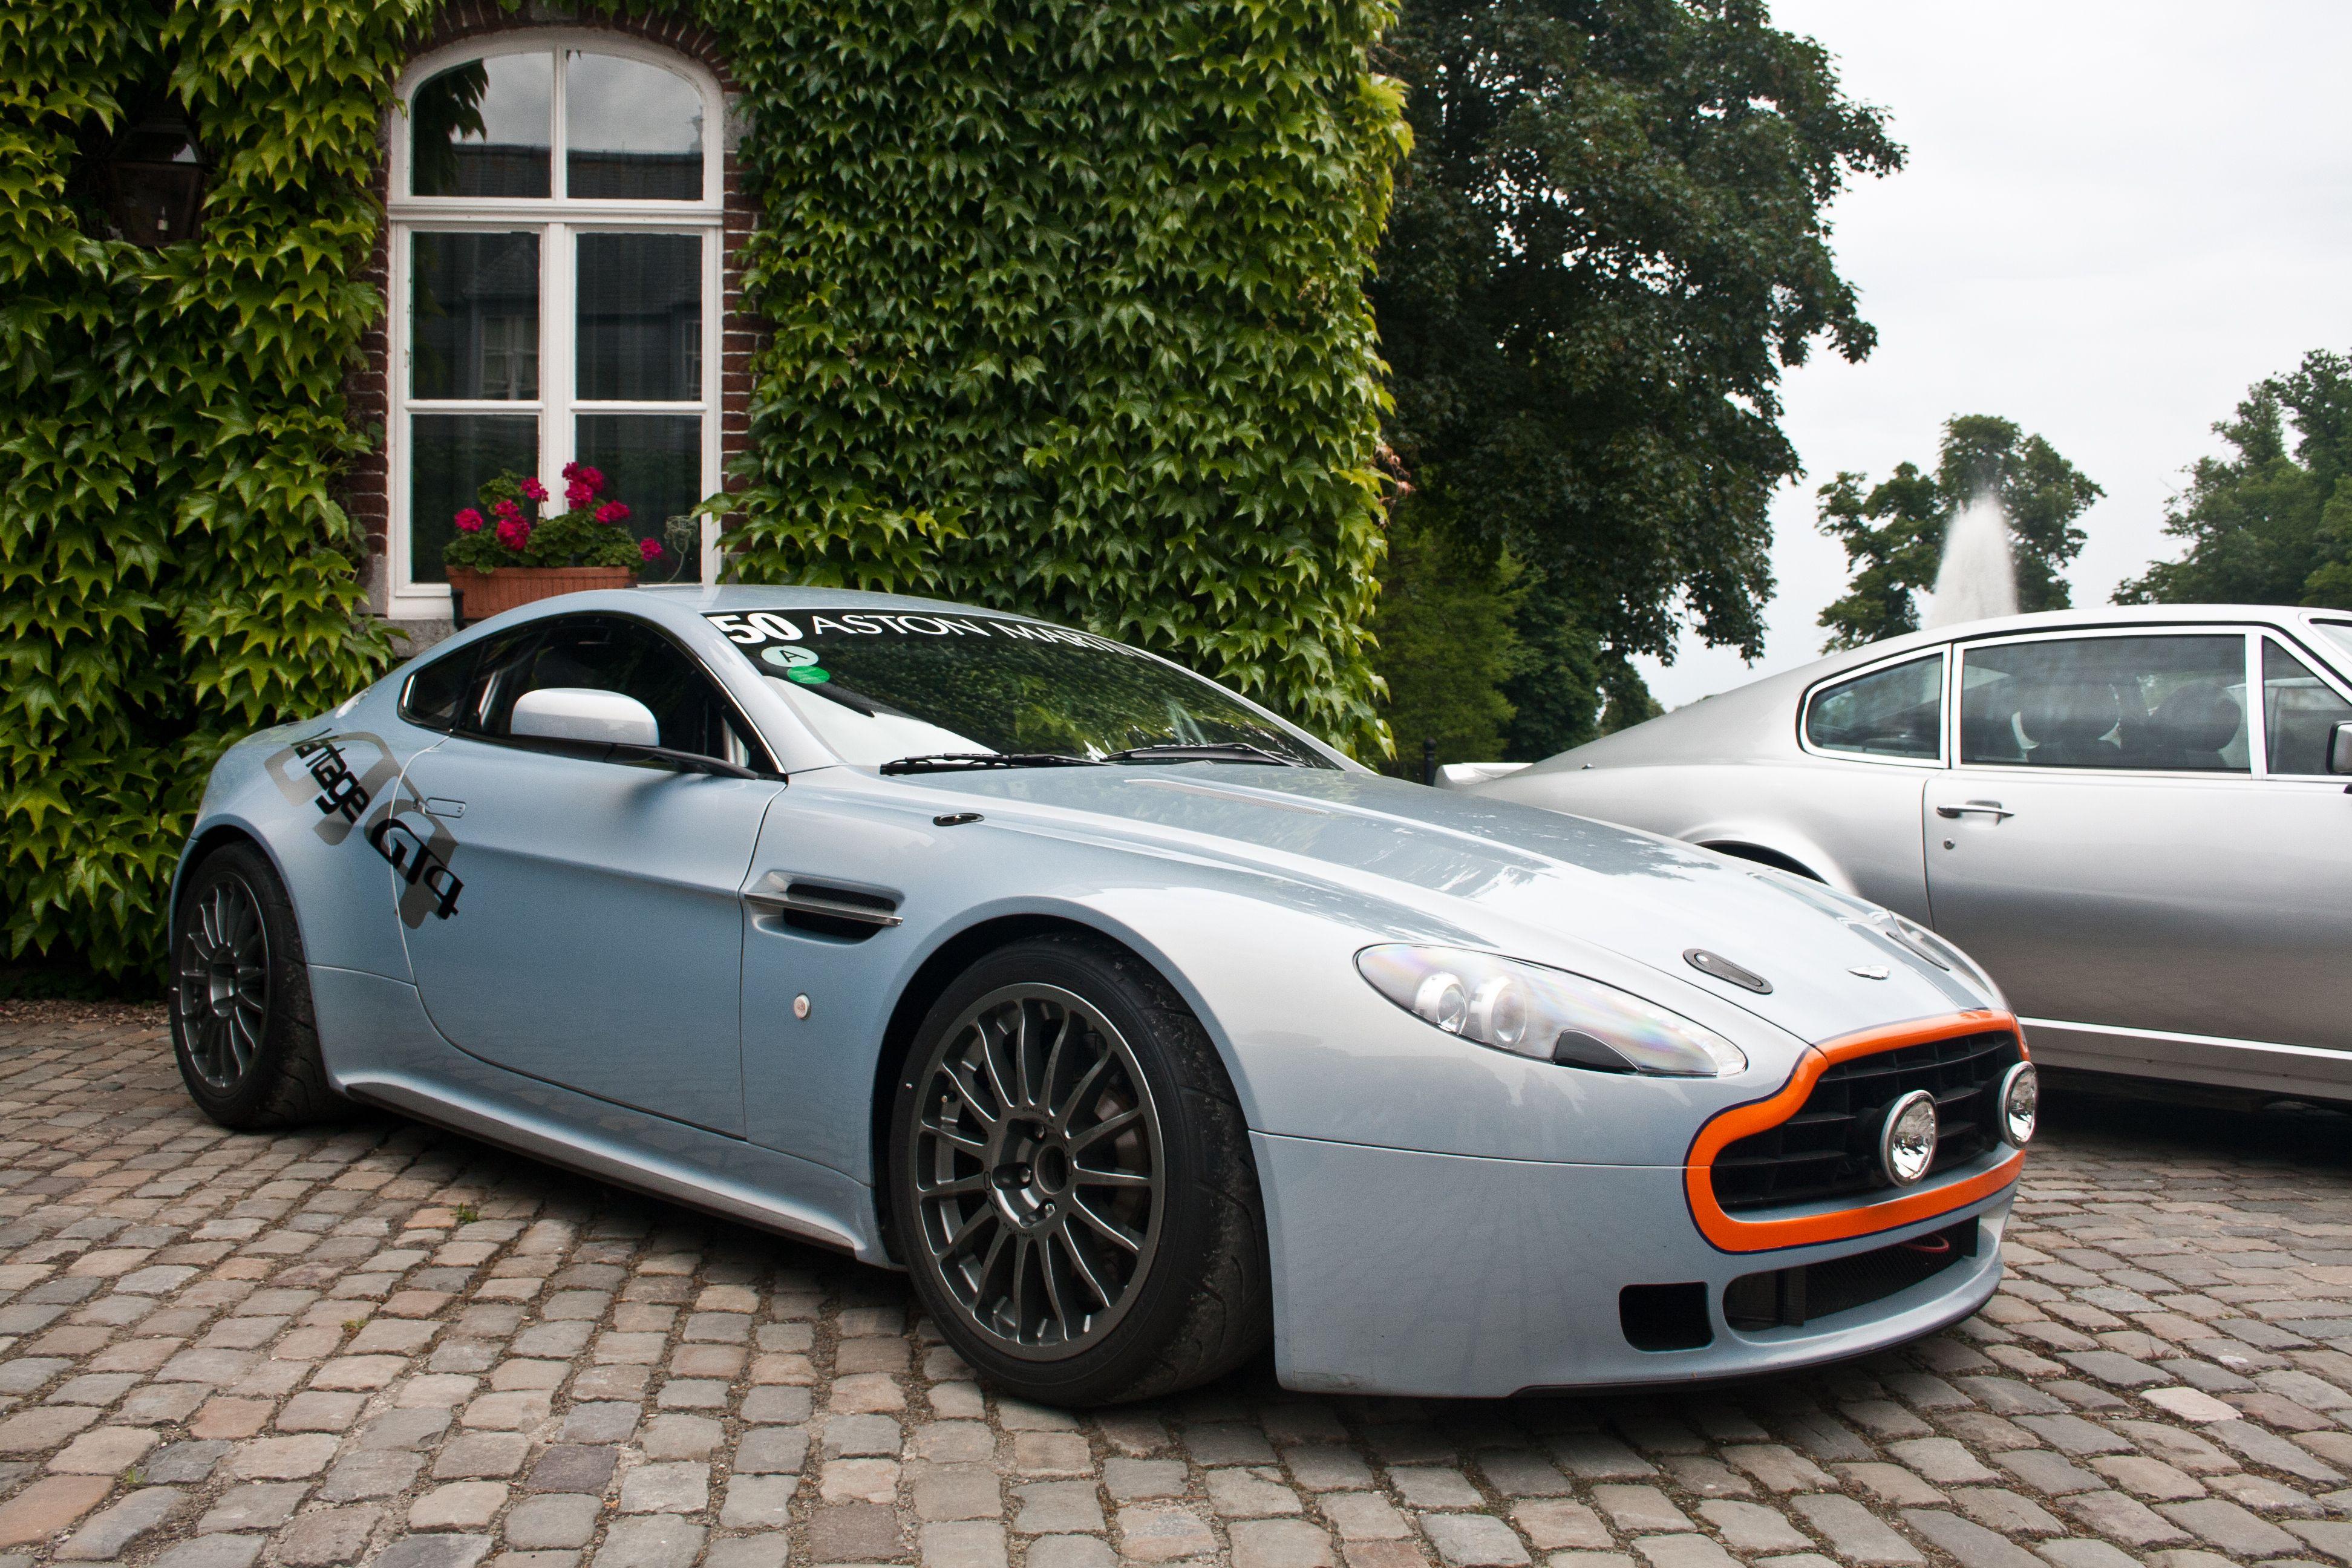 Aston Martin V8 Vantage GT4 Αυτοκίνητα Pinterest